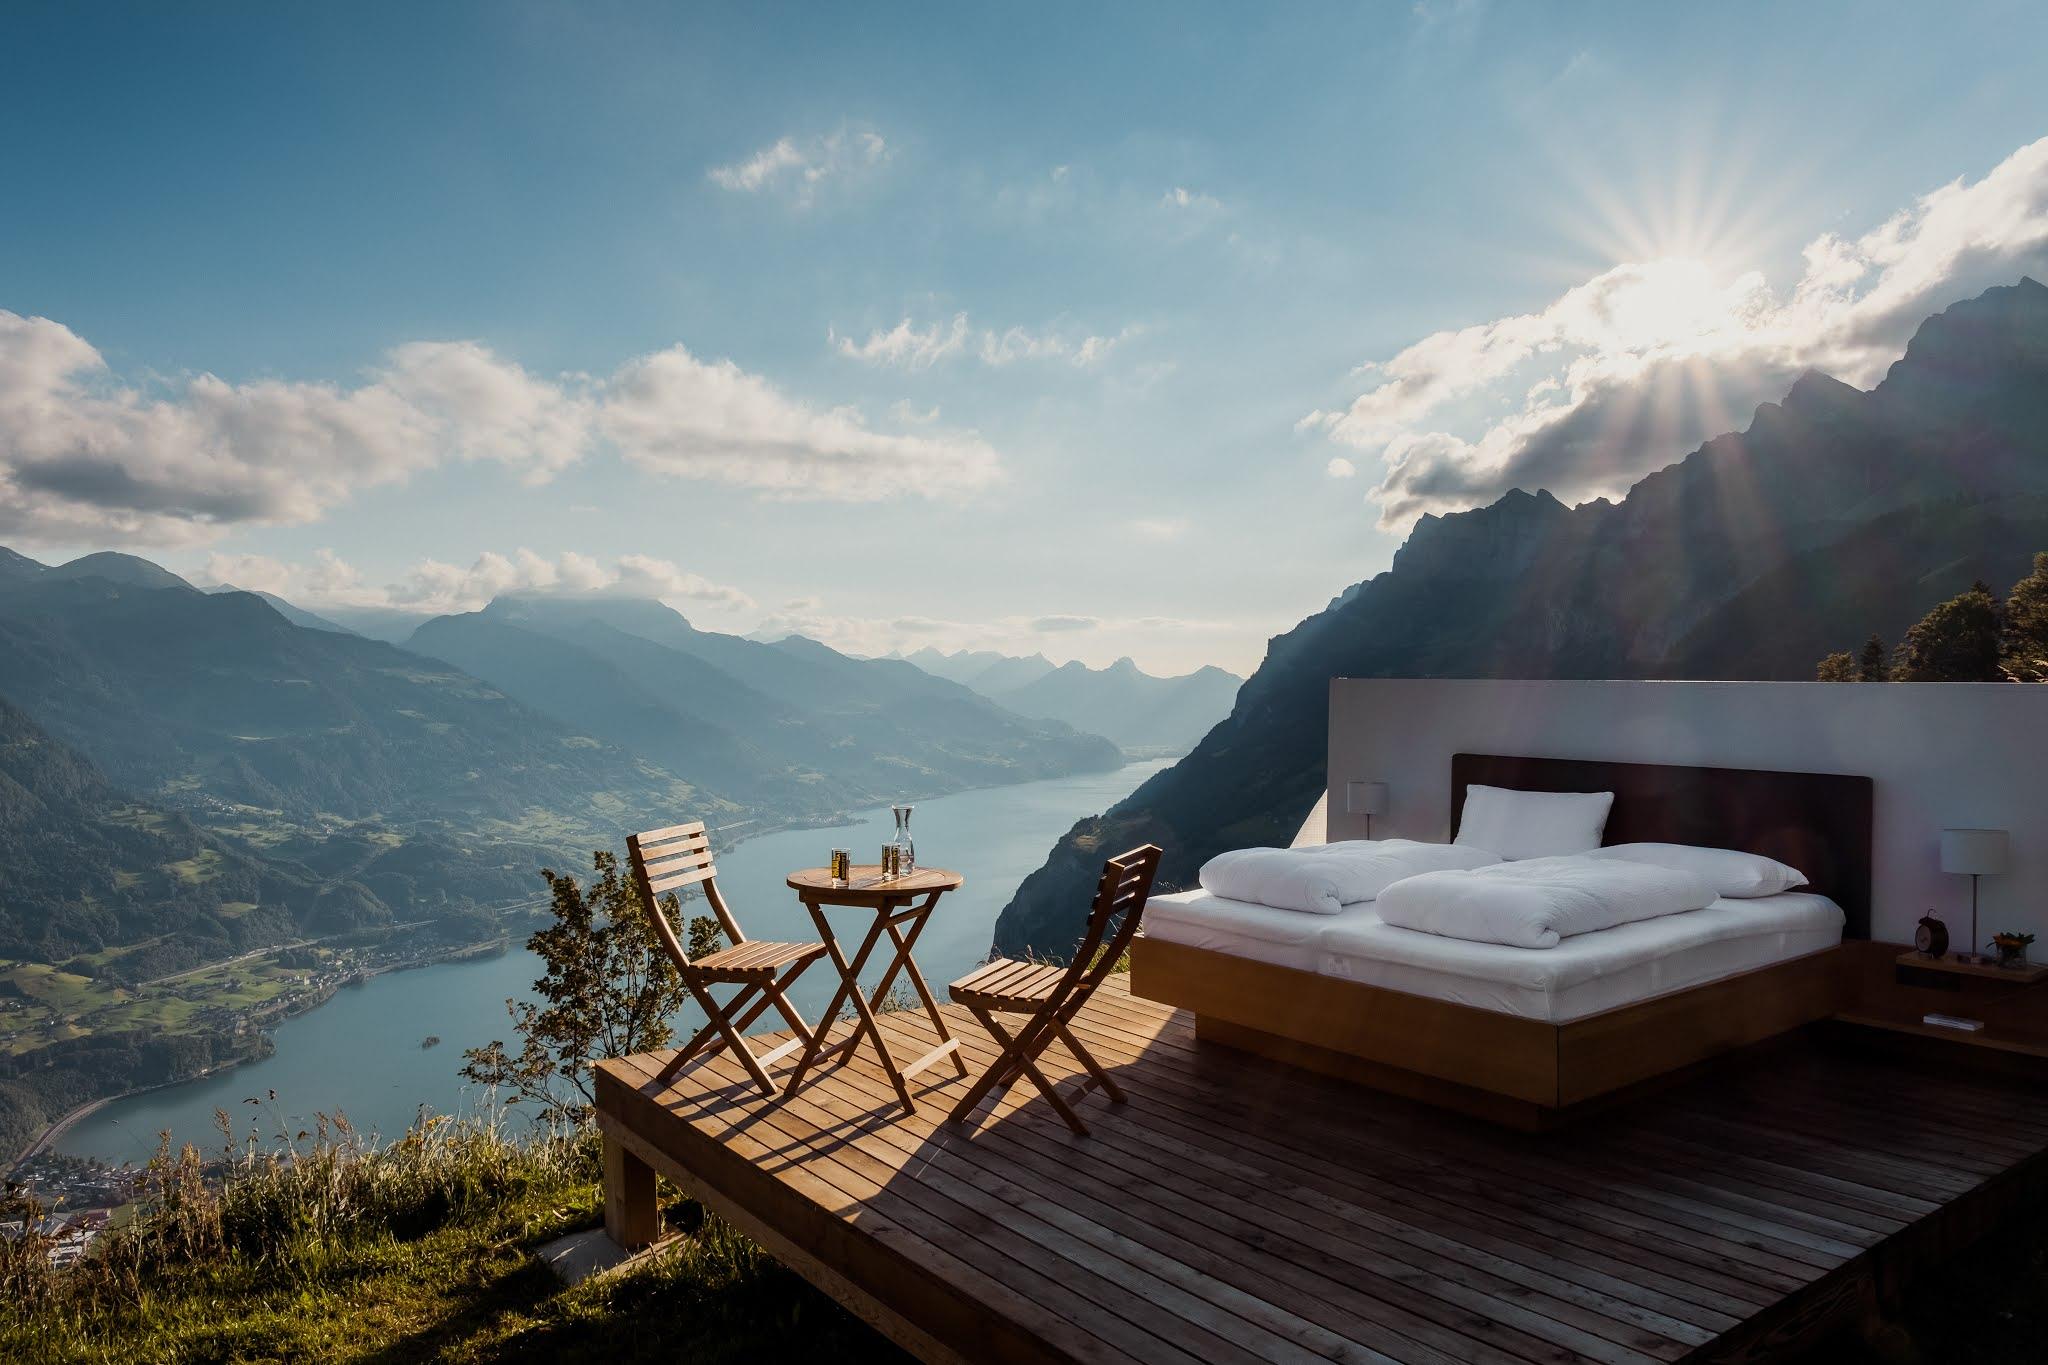 Hotel na natureza